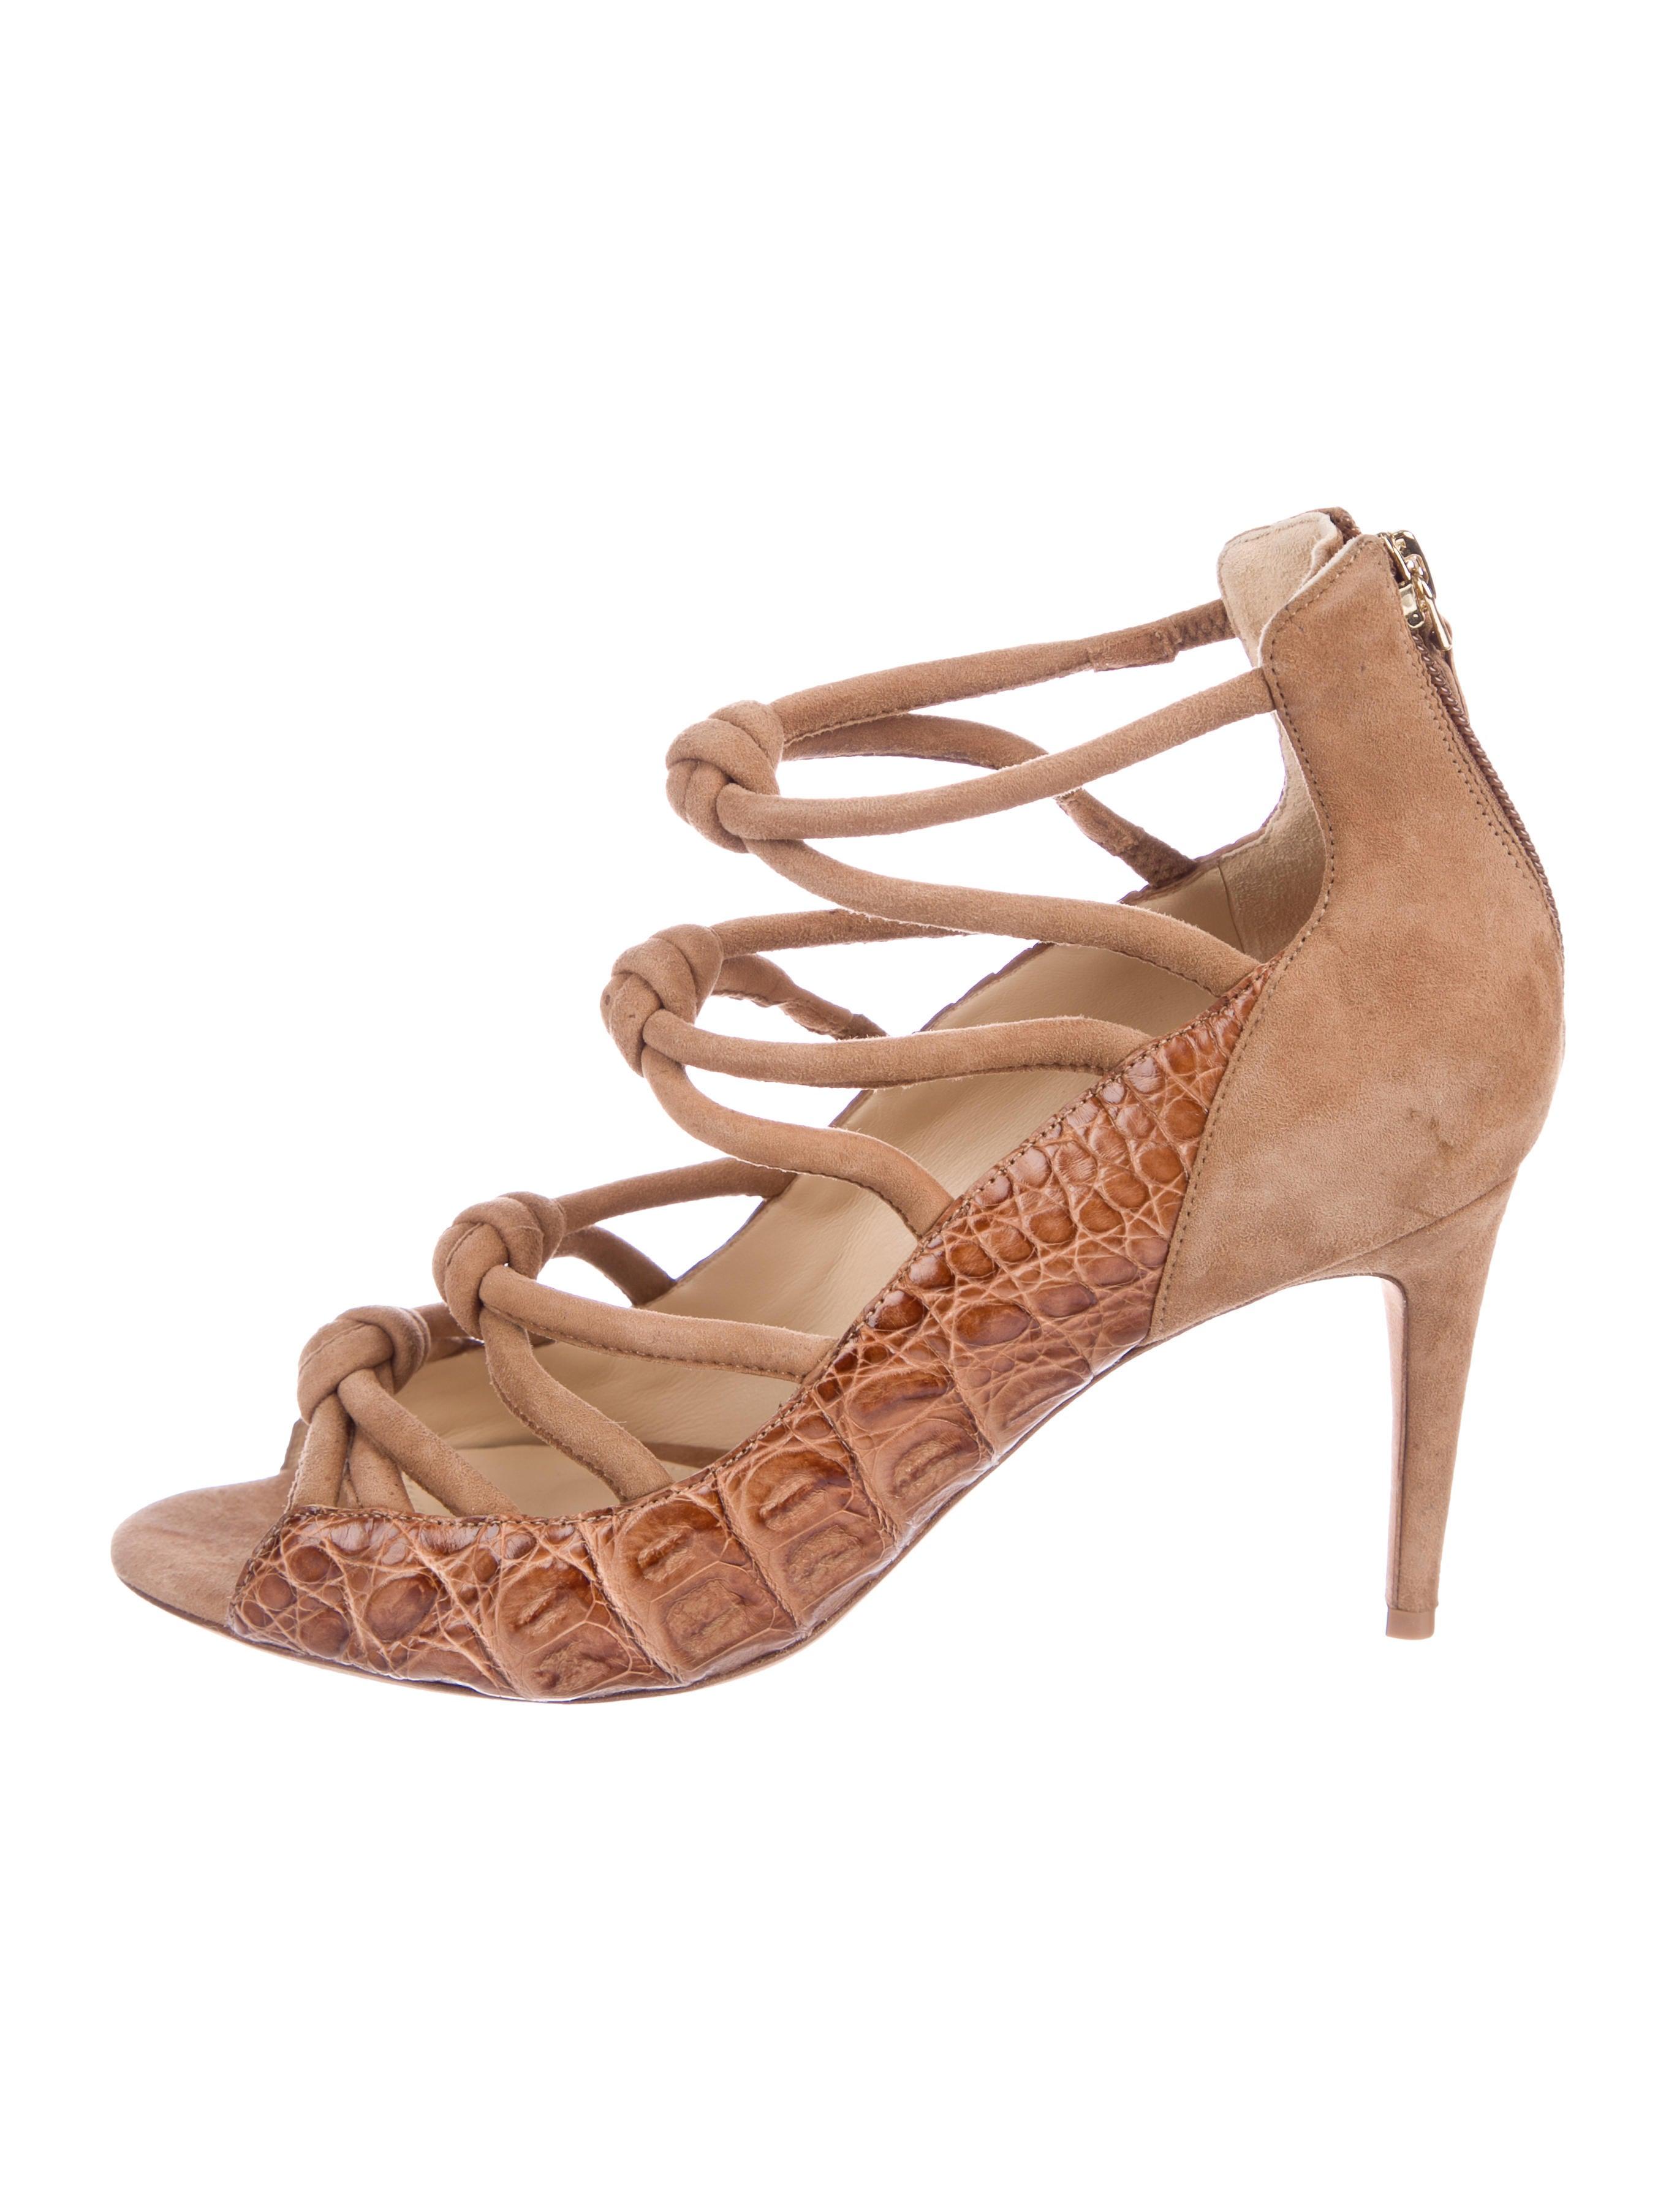 clearance sast Alexandre Birman Suede Crocodile Sandals cheap websites discounts for sale authentic sale footlocker 0SVuXGCN